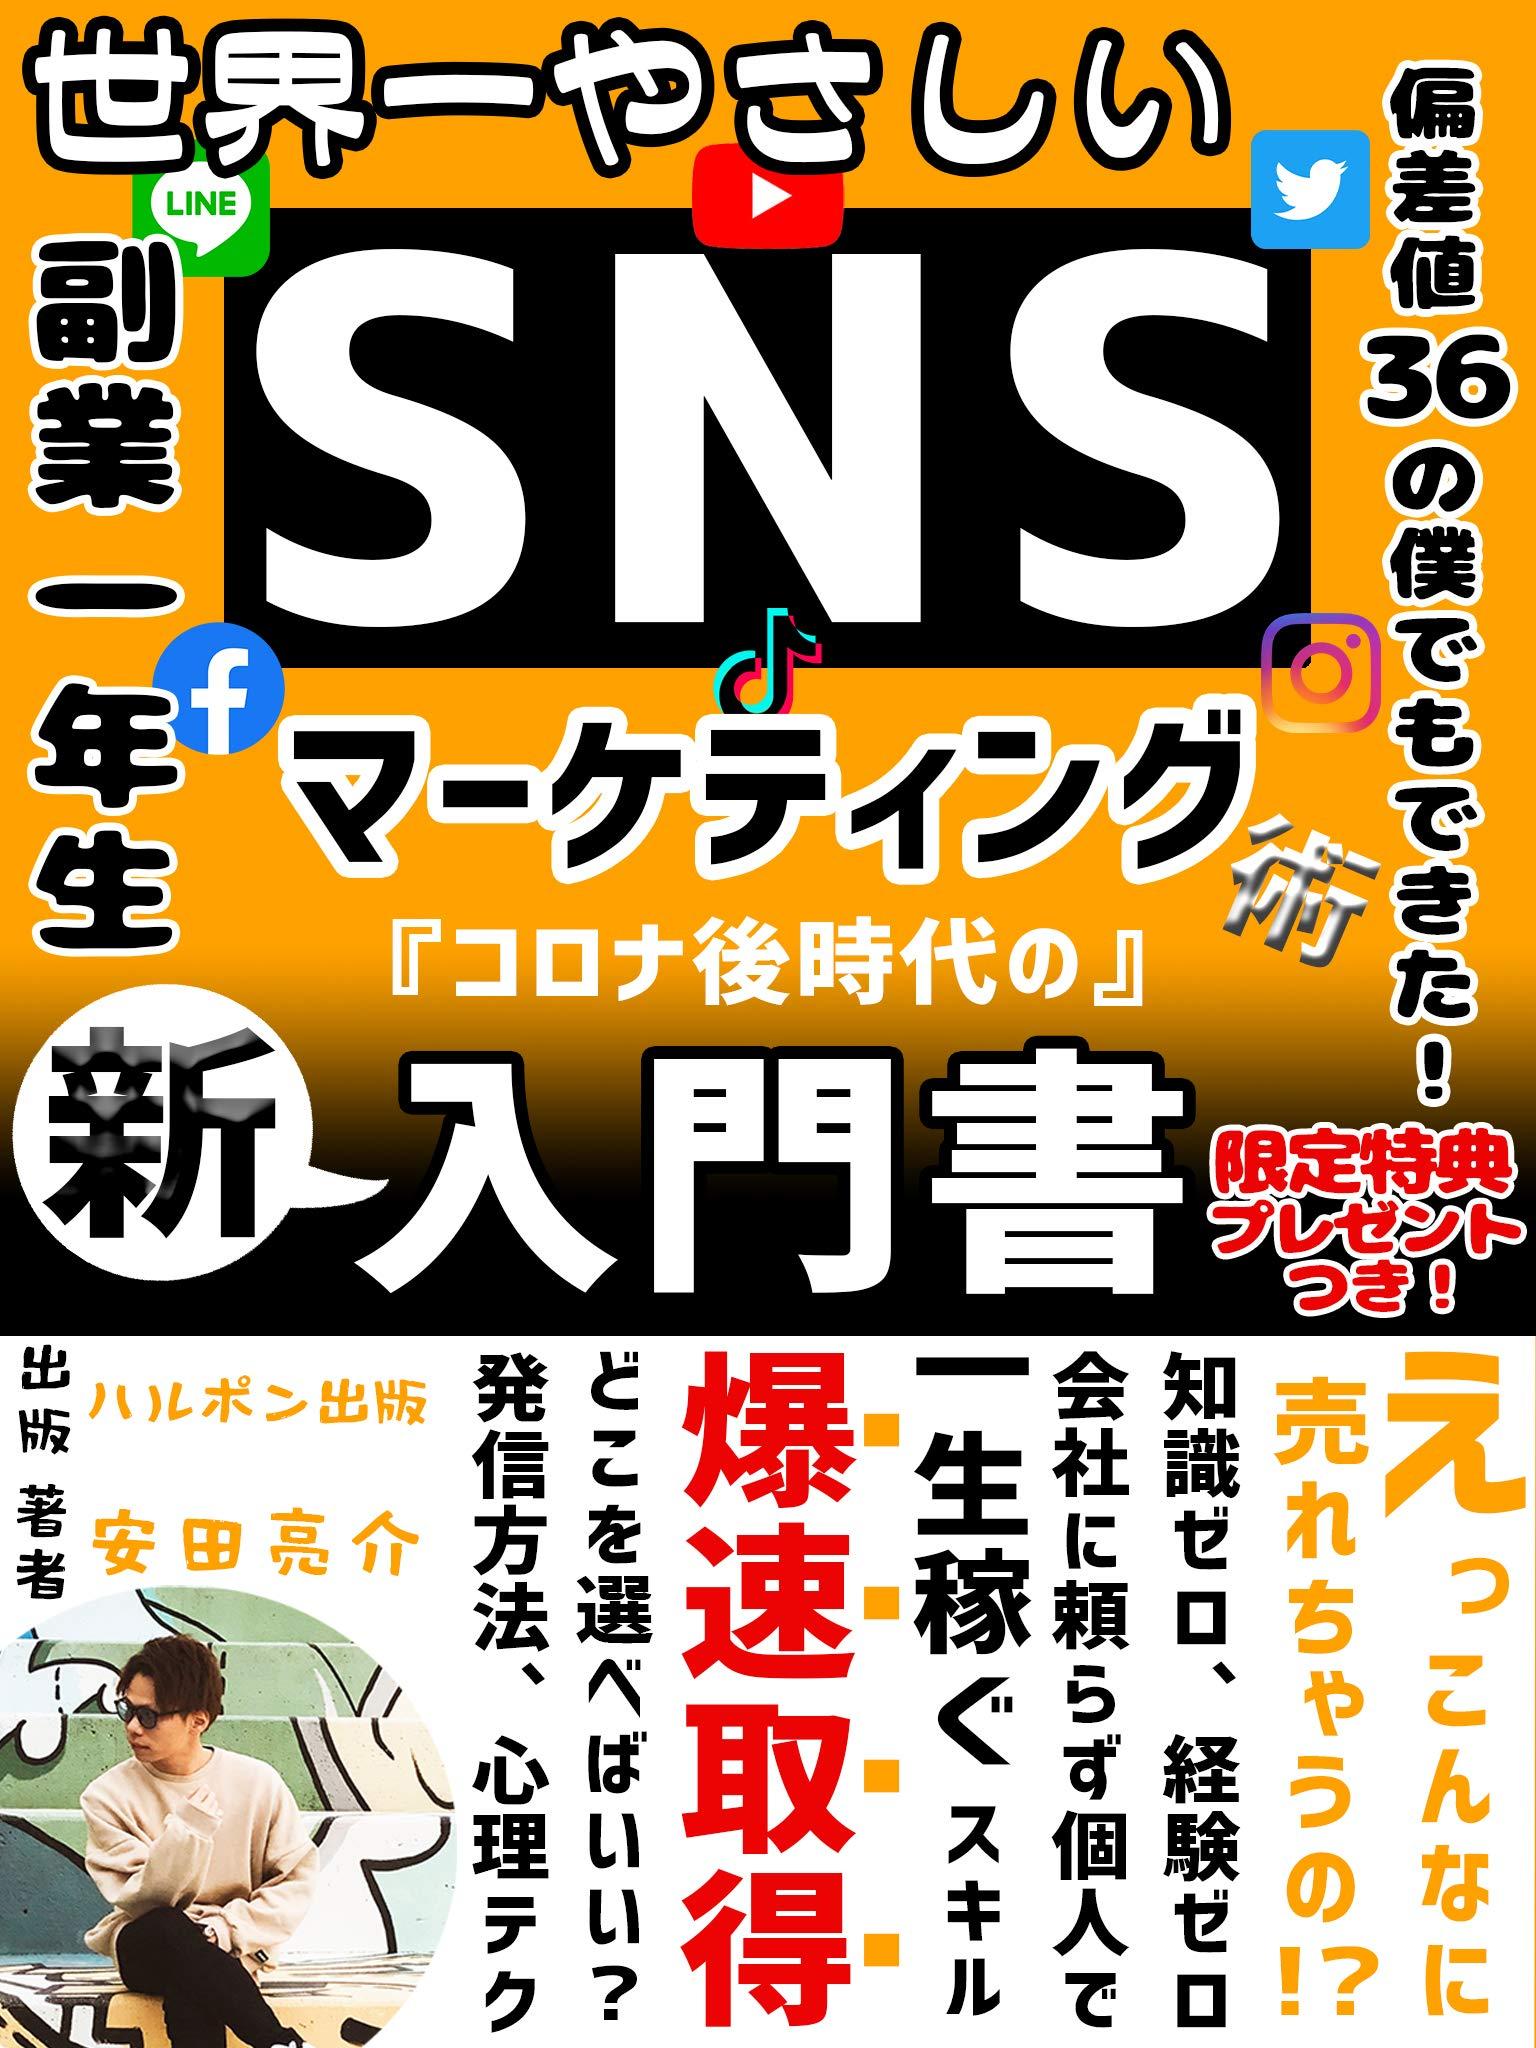 sekaiitiyasasiisnsma-ketingnonyuumonsyo: sinkoronazidainoissyoukasegusukiru (Japanese Edition)